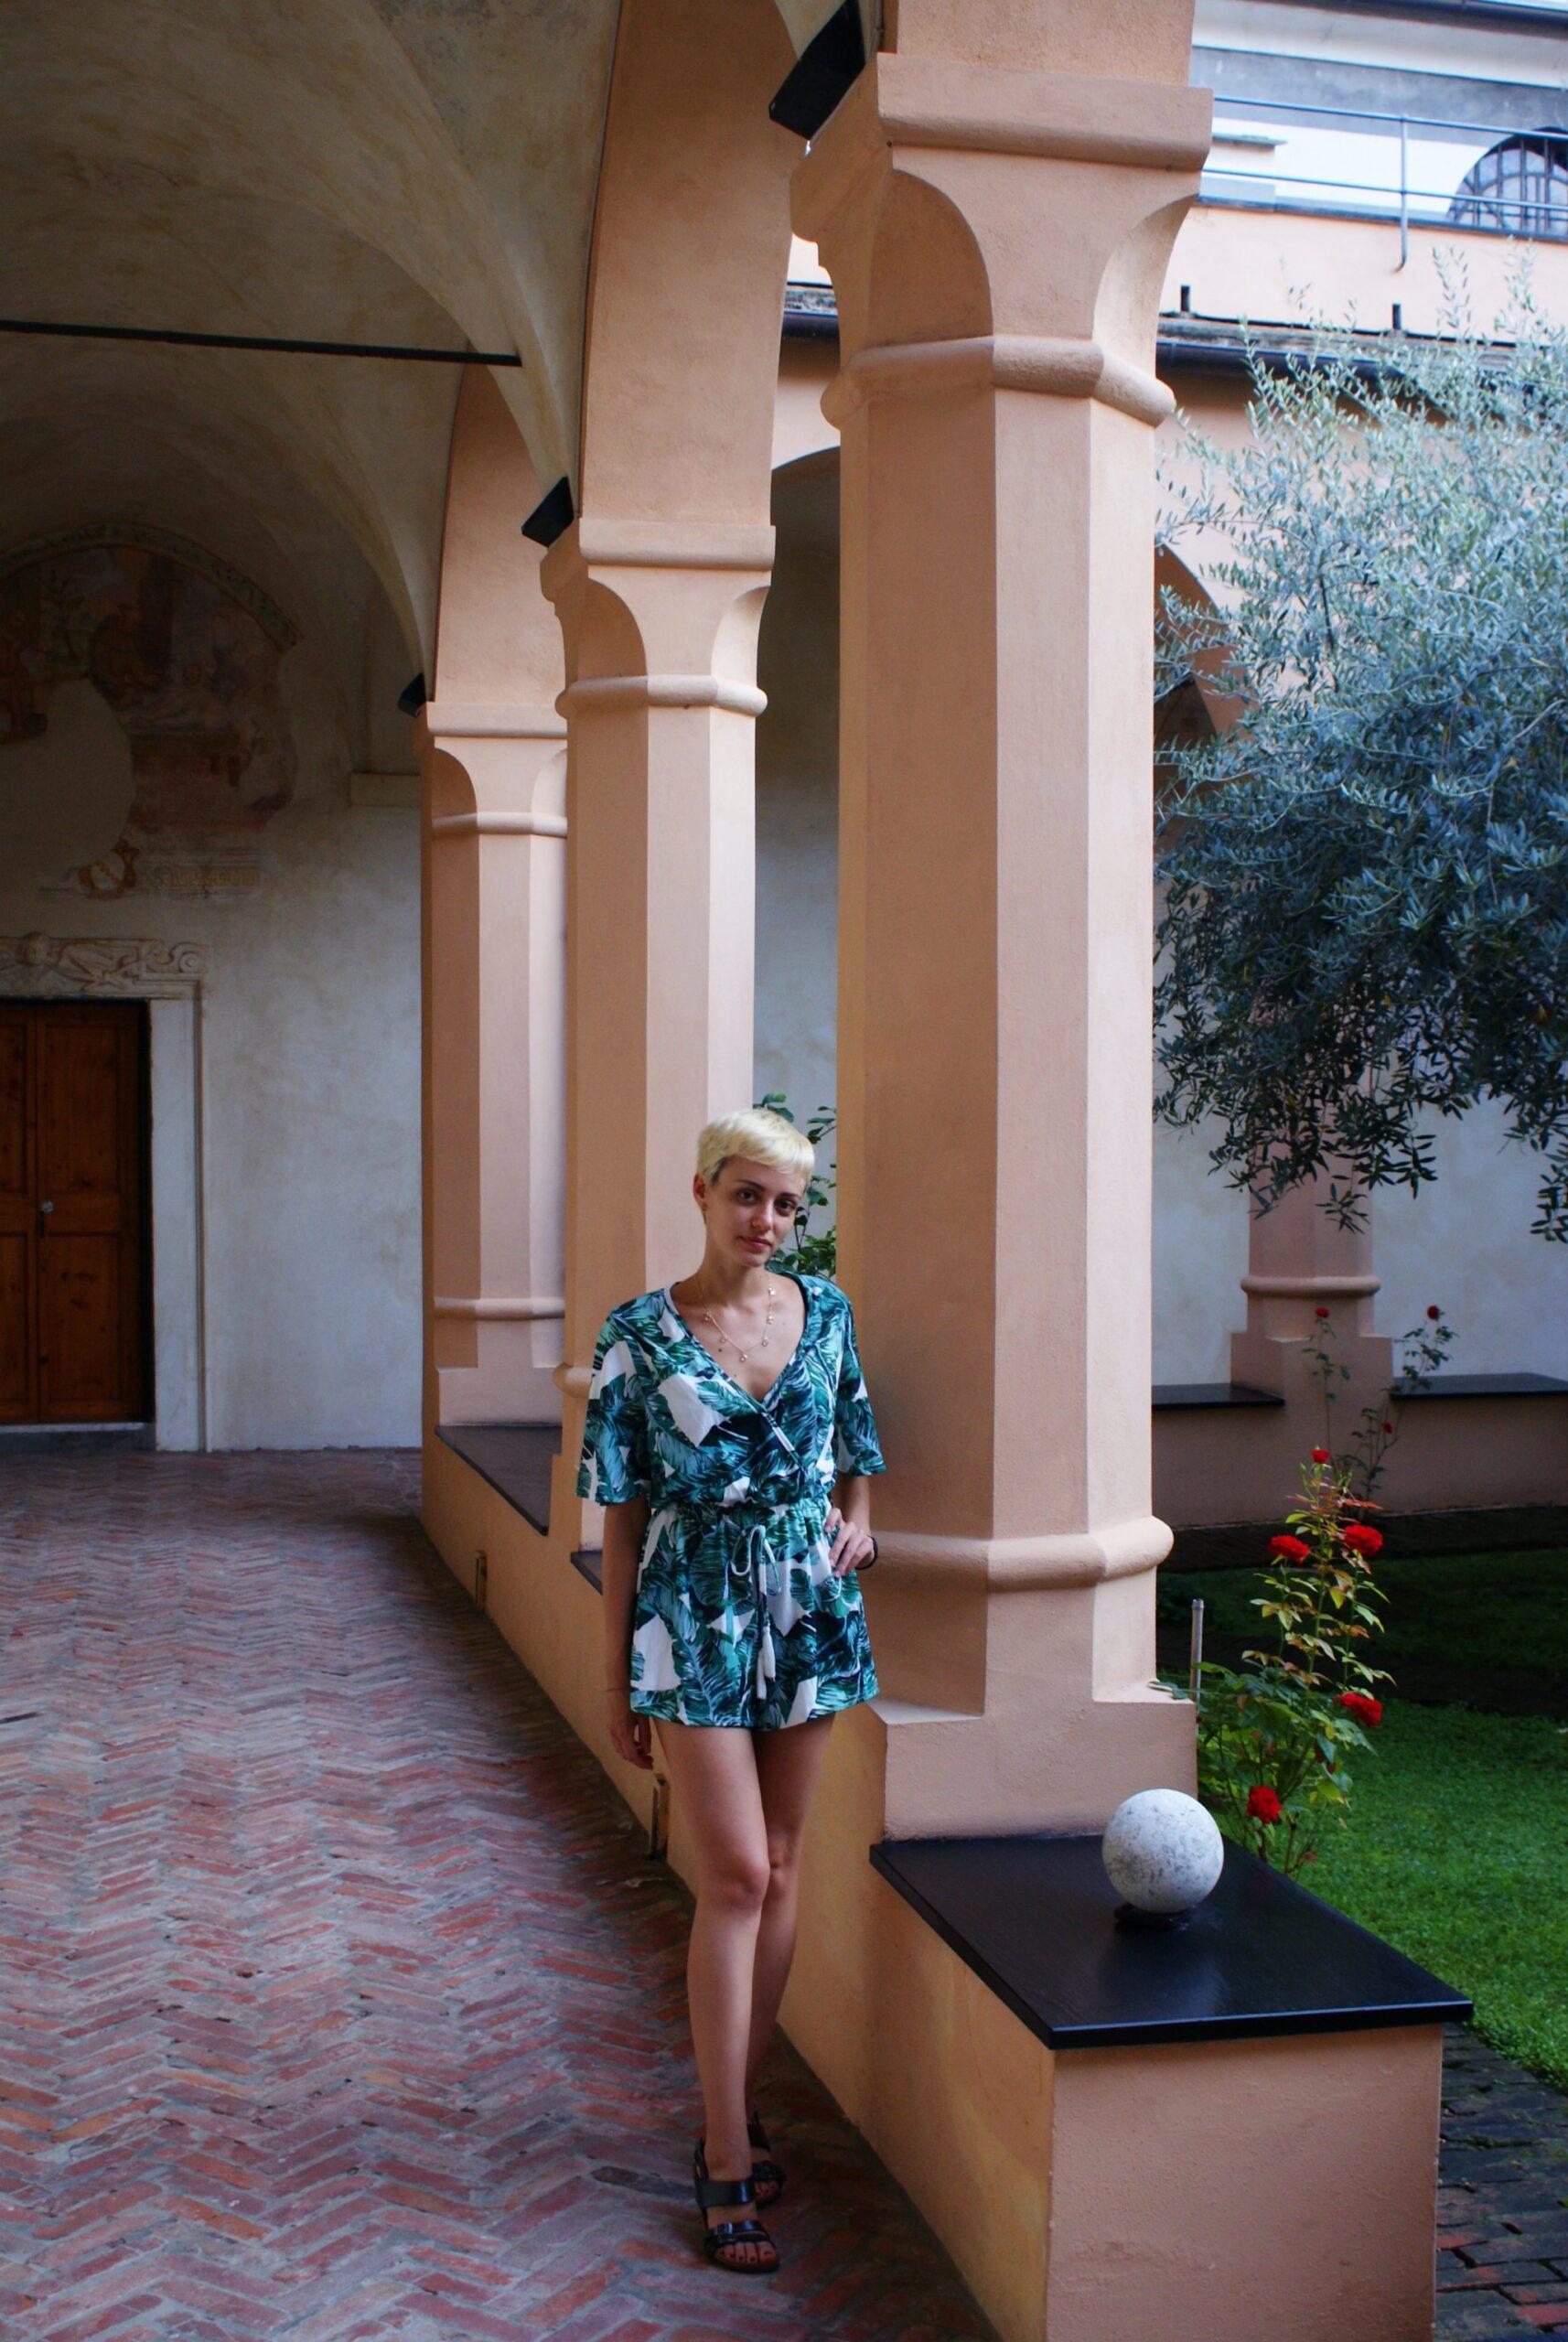 elisa pizzola blogger diy lifestyle italia